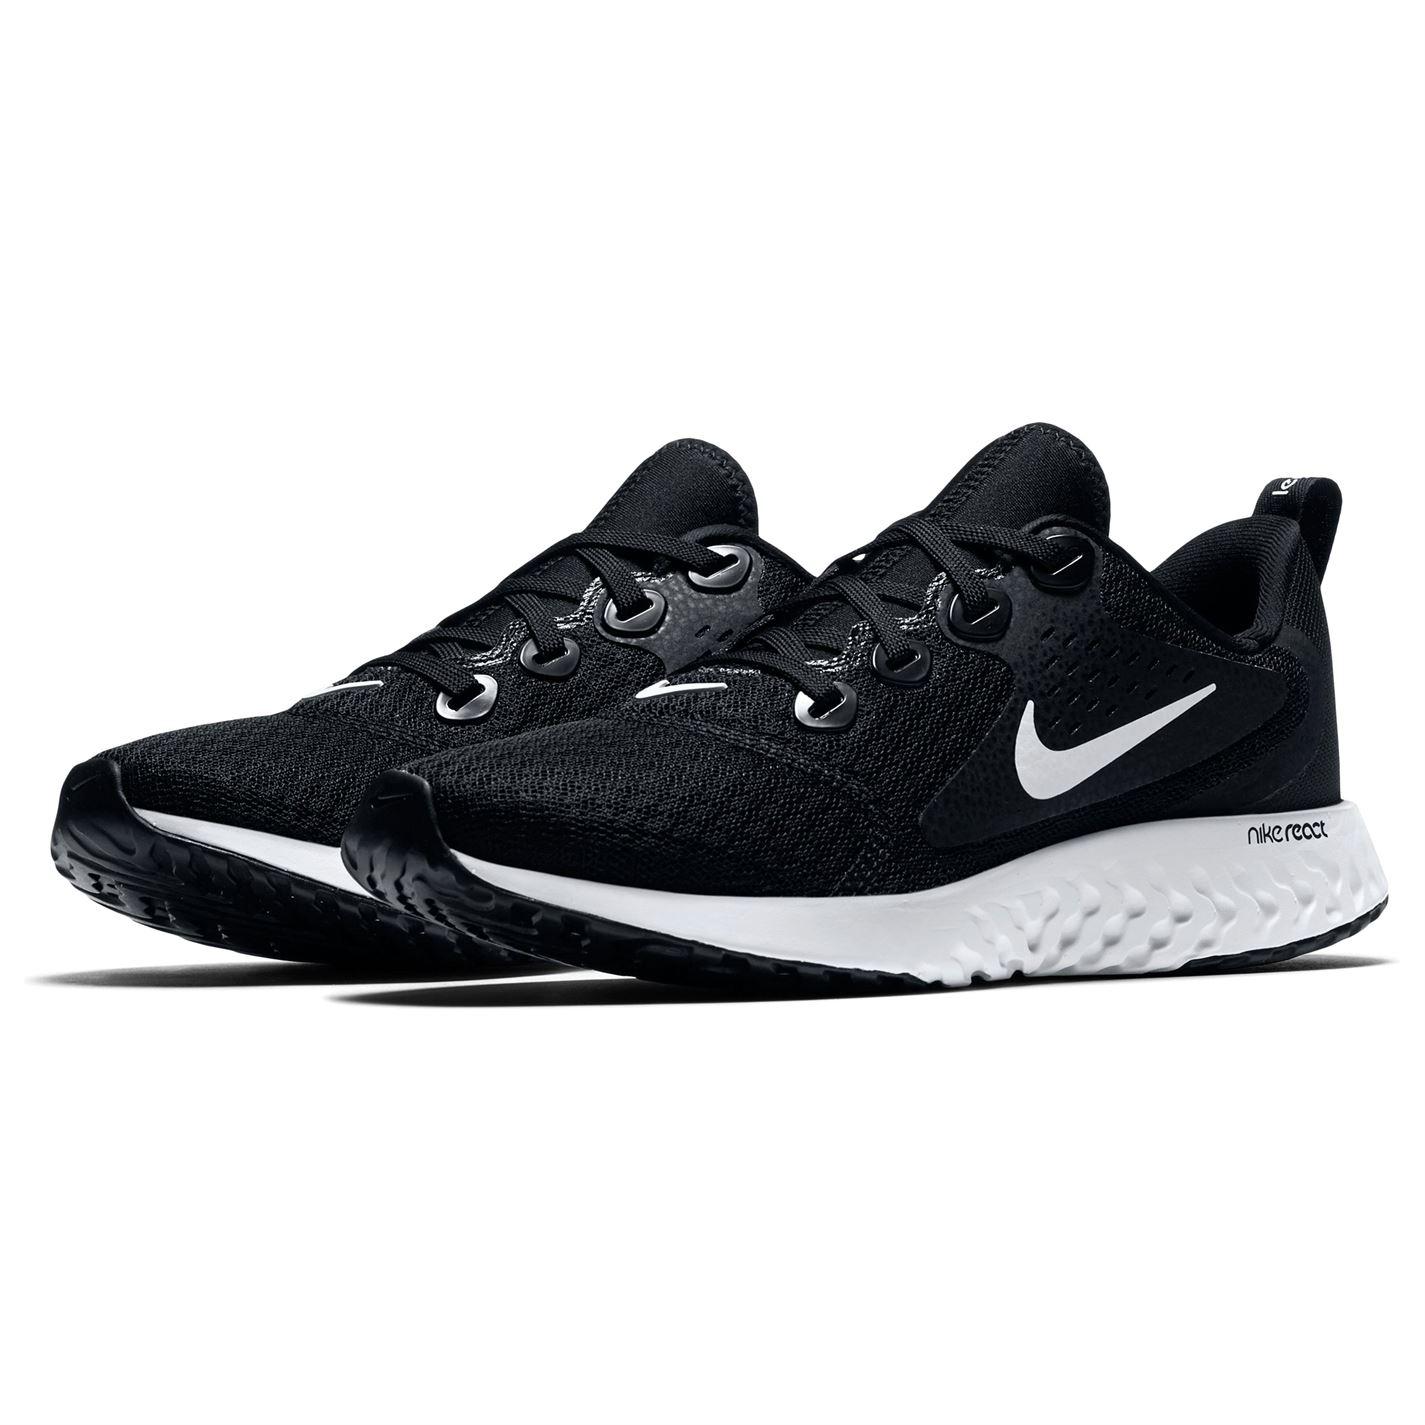 save off a79b7 14672 ... Sportske tenisice Nike Legend React Junior Boys Running Shoes. Novo  Sportske ...